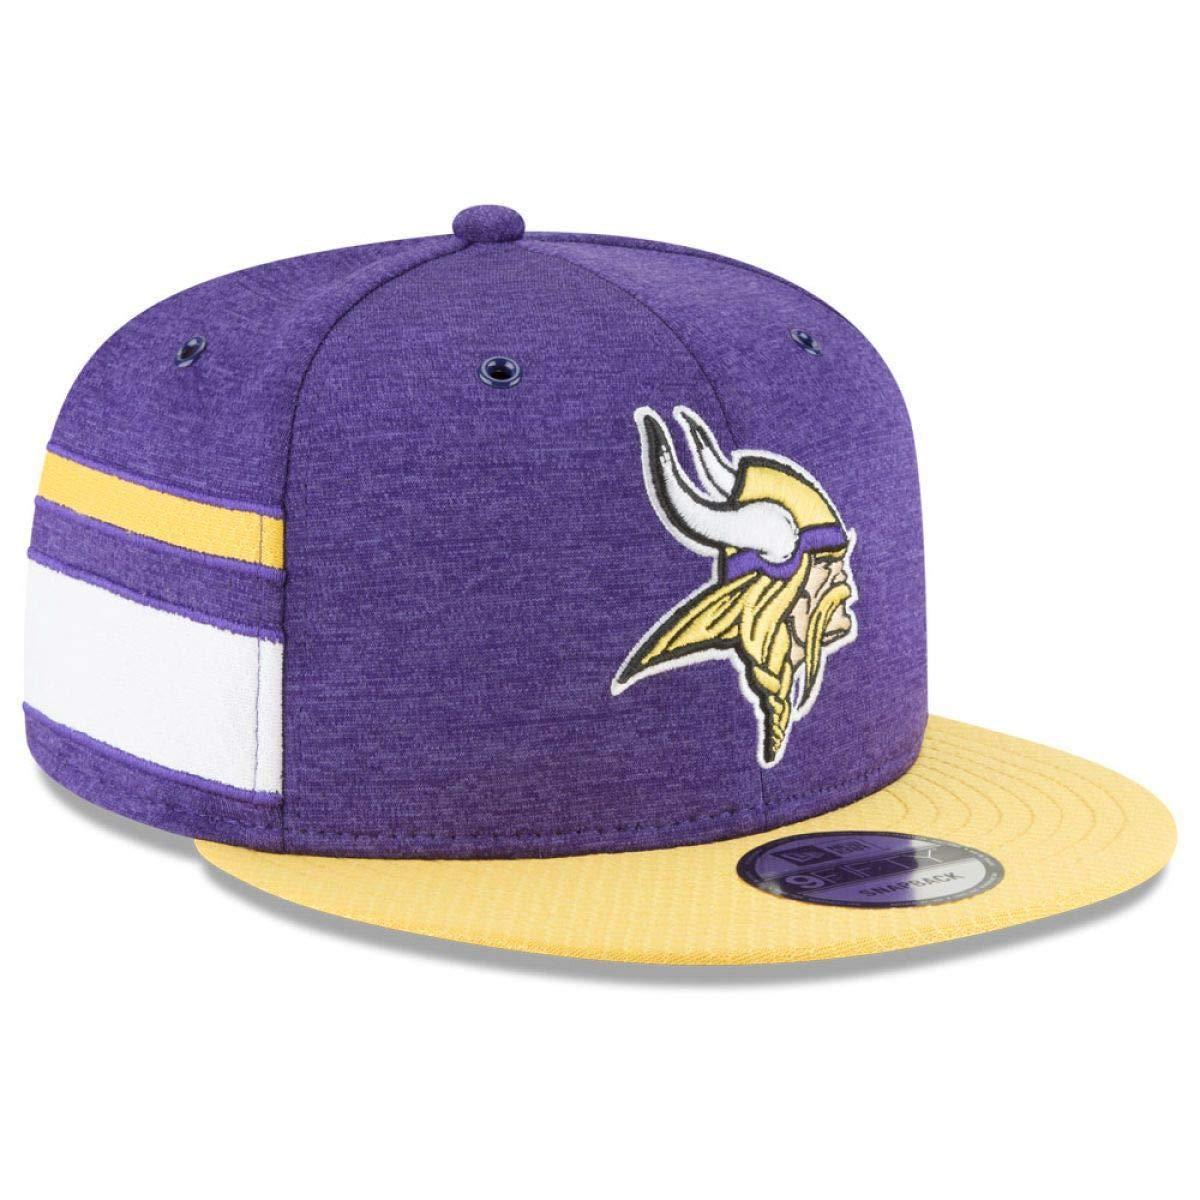 acd8da9fb Amazon.com  New Era Minnesota Vikings 2018 NFL Sideline Home Official  9FIFTY Snapback Hat Purple  Sports   Outdoors